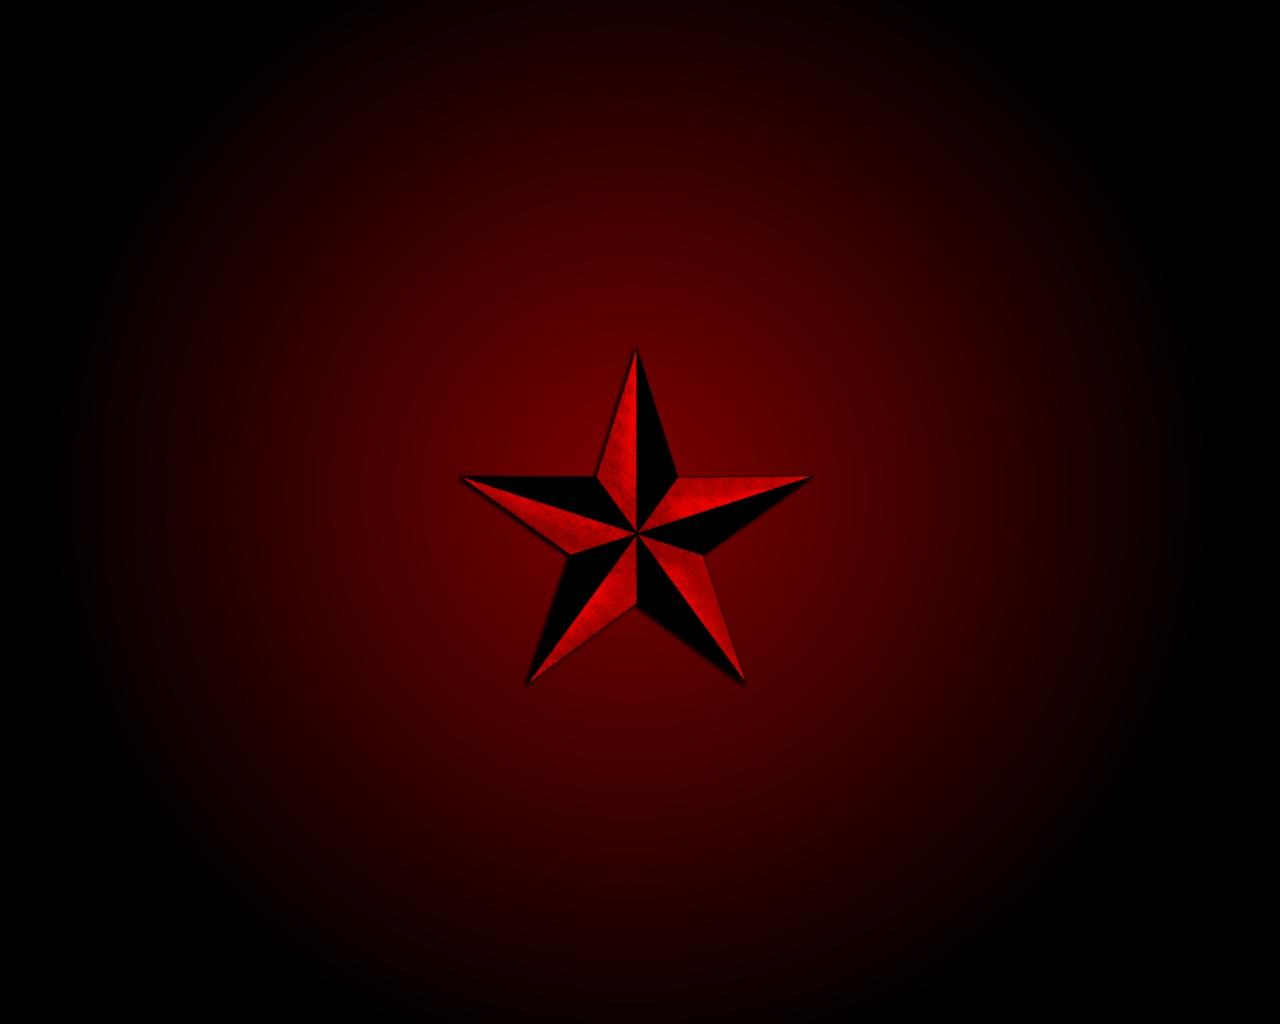 nautical stars abstract wallpaper - photo #5